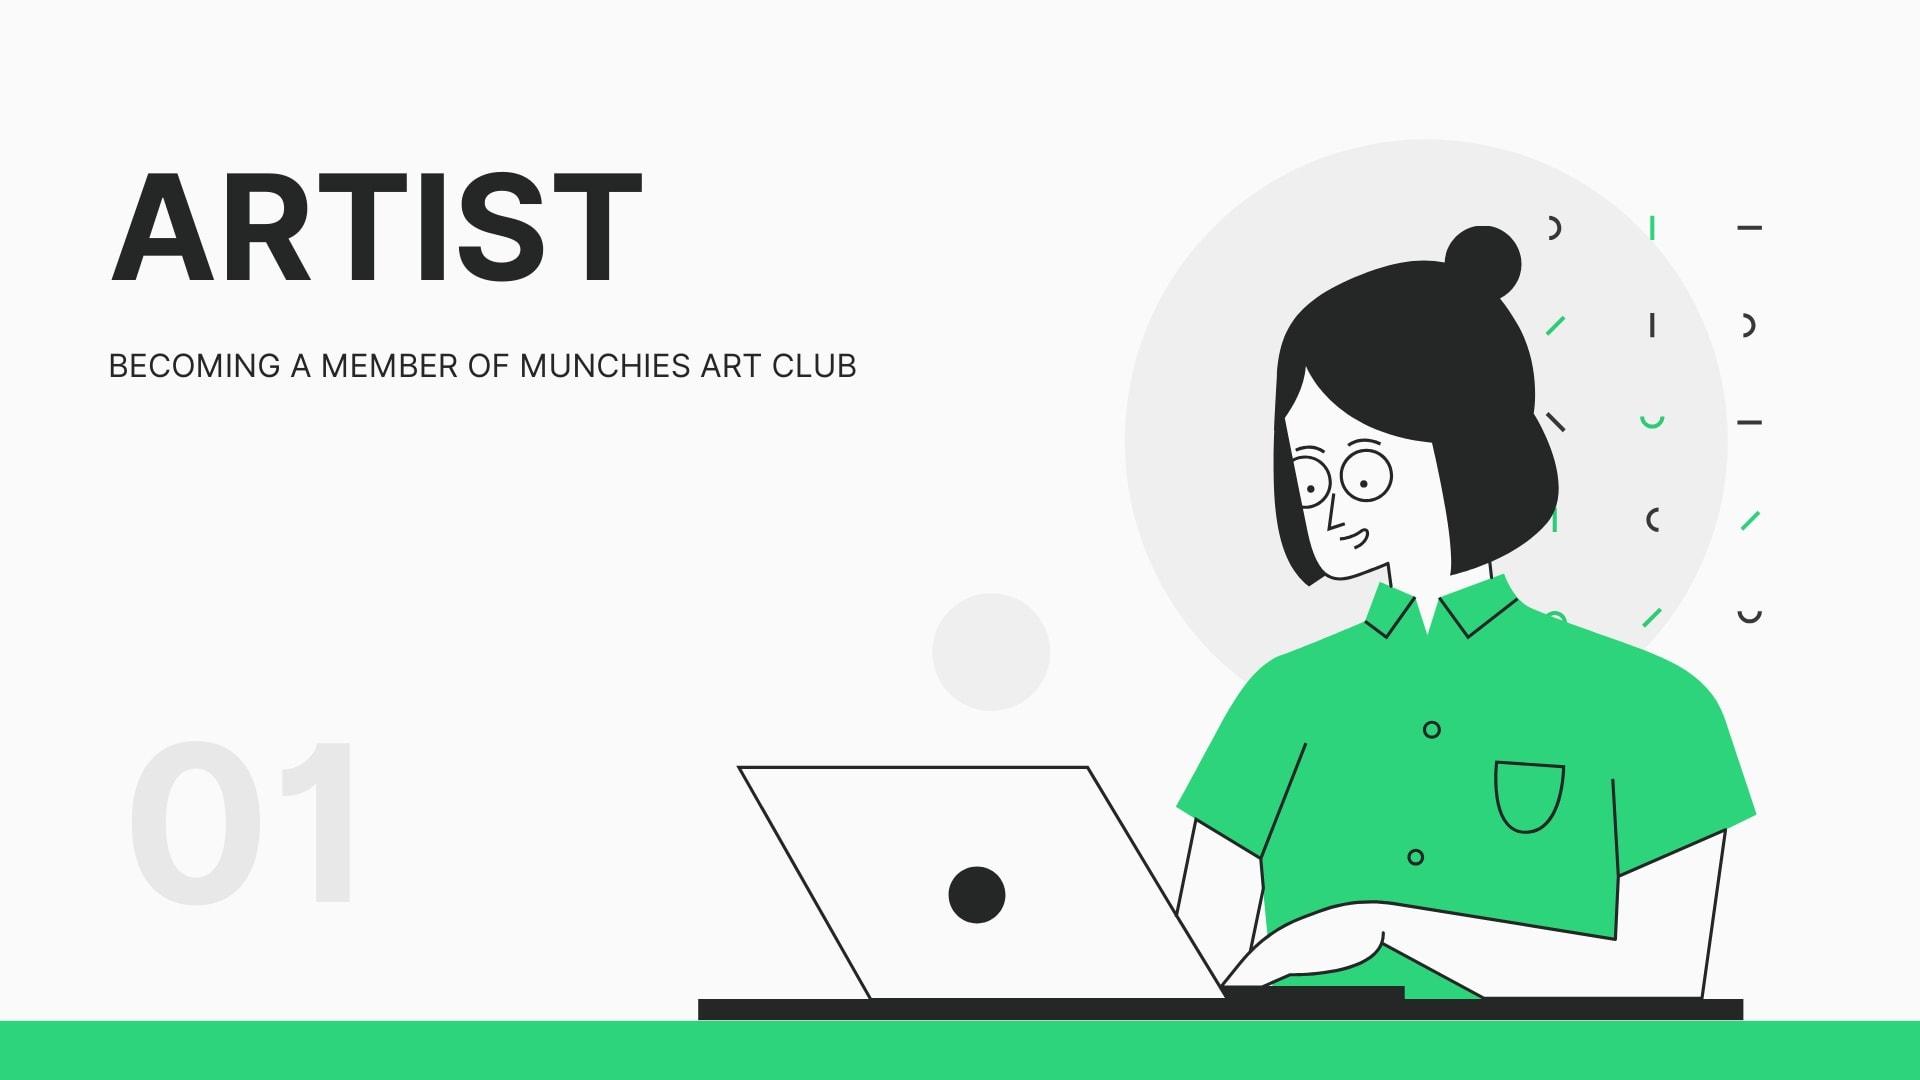 how to make money on instagram or internet member ship munchies art club